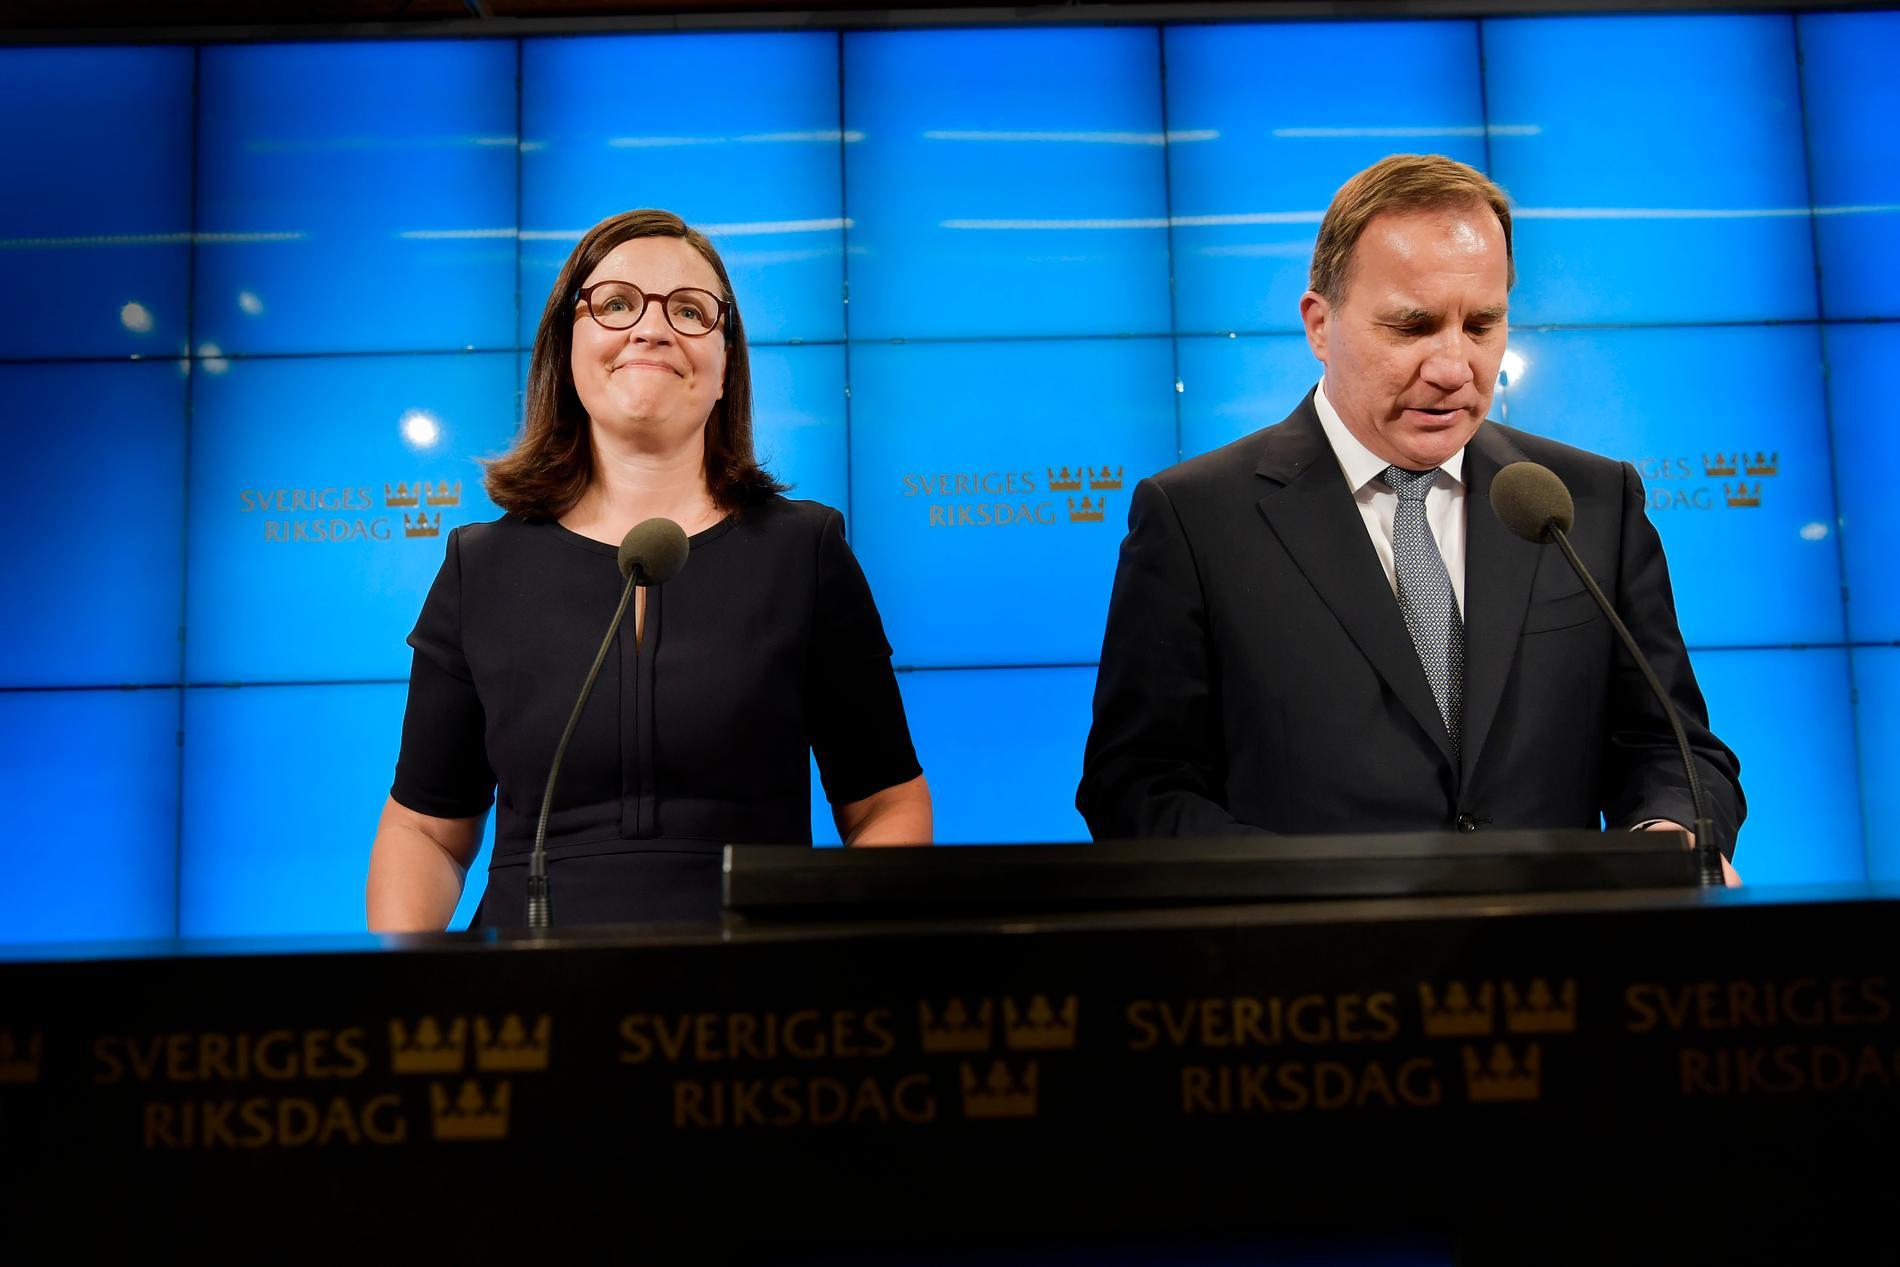 Gymnasieminister Anna Ekström och Stefan Löfven.